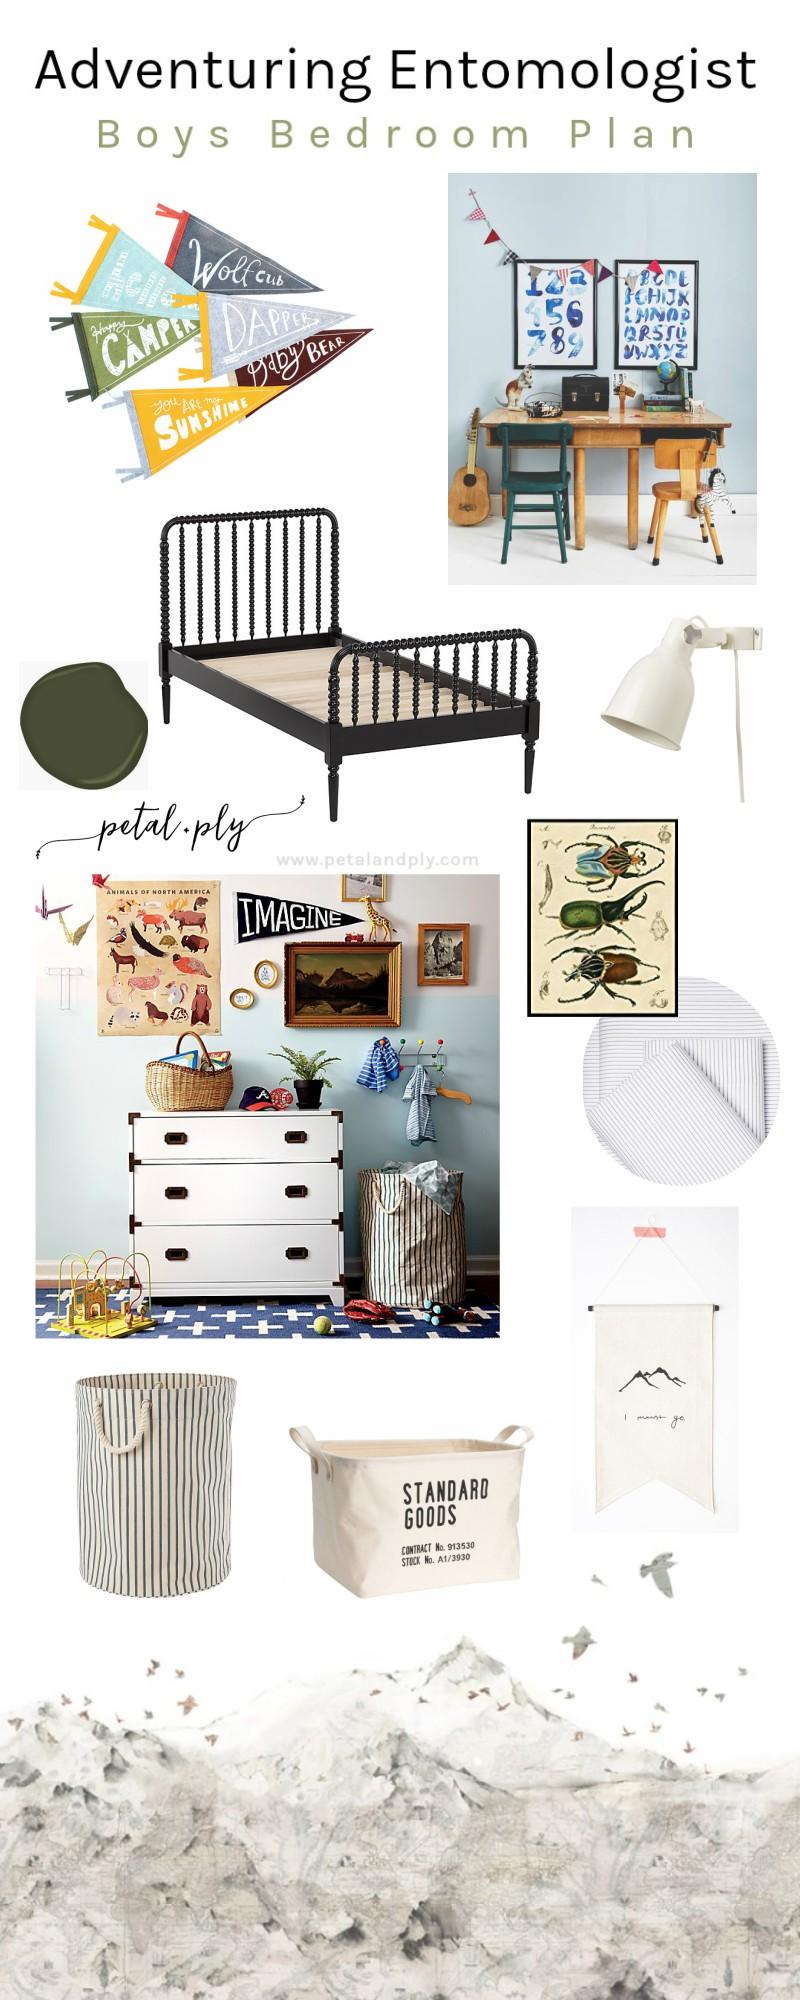 adventuring-entomologist-boys-bedroom-plan